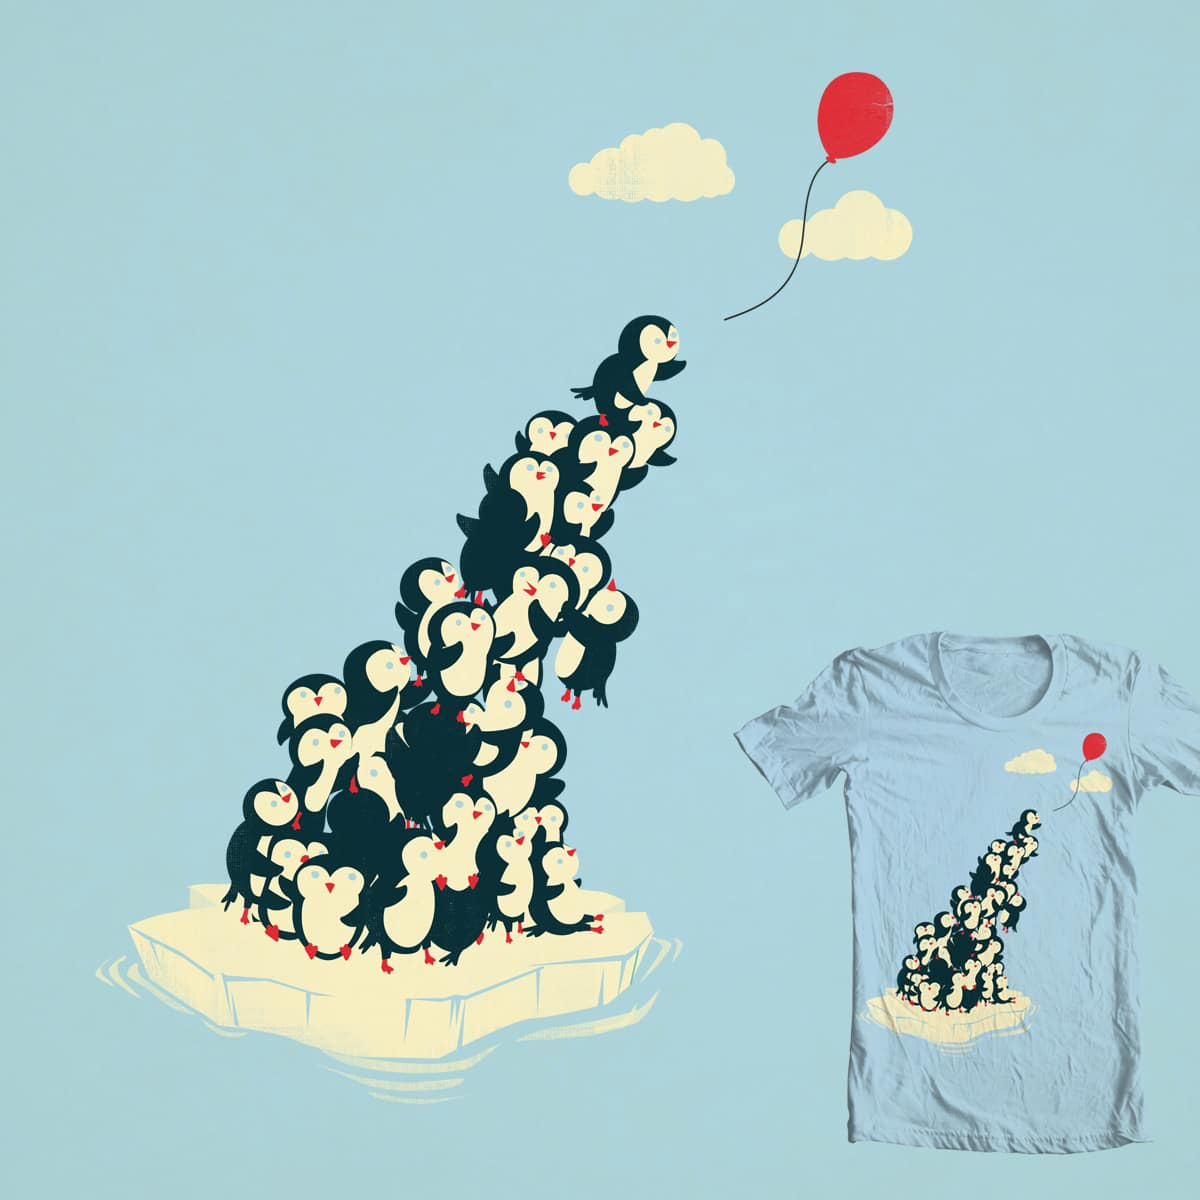 Balloon! by DontCallMeBlanket on Threadless